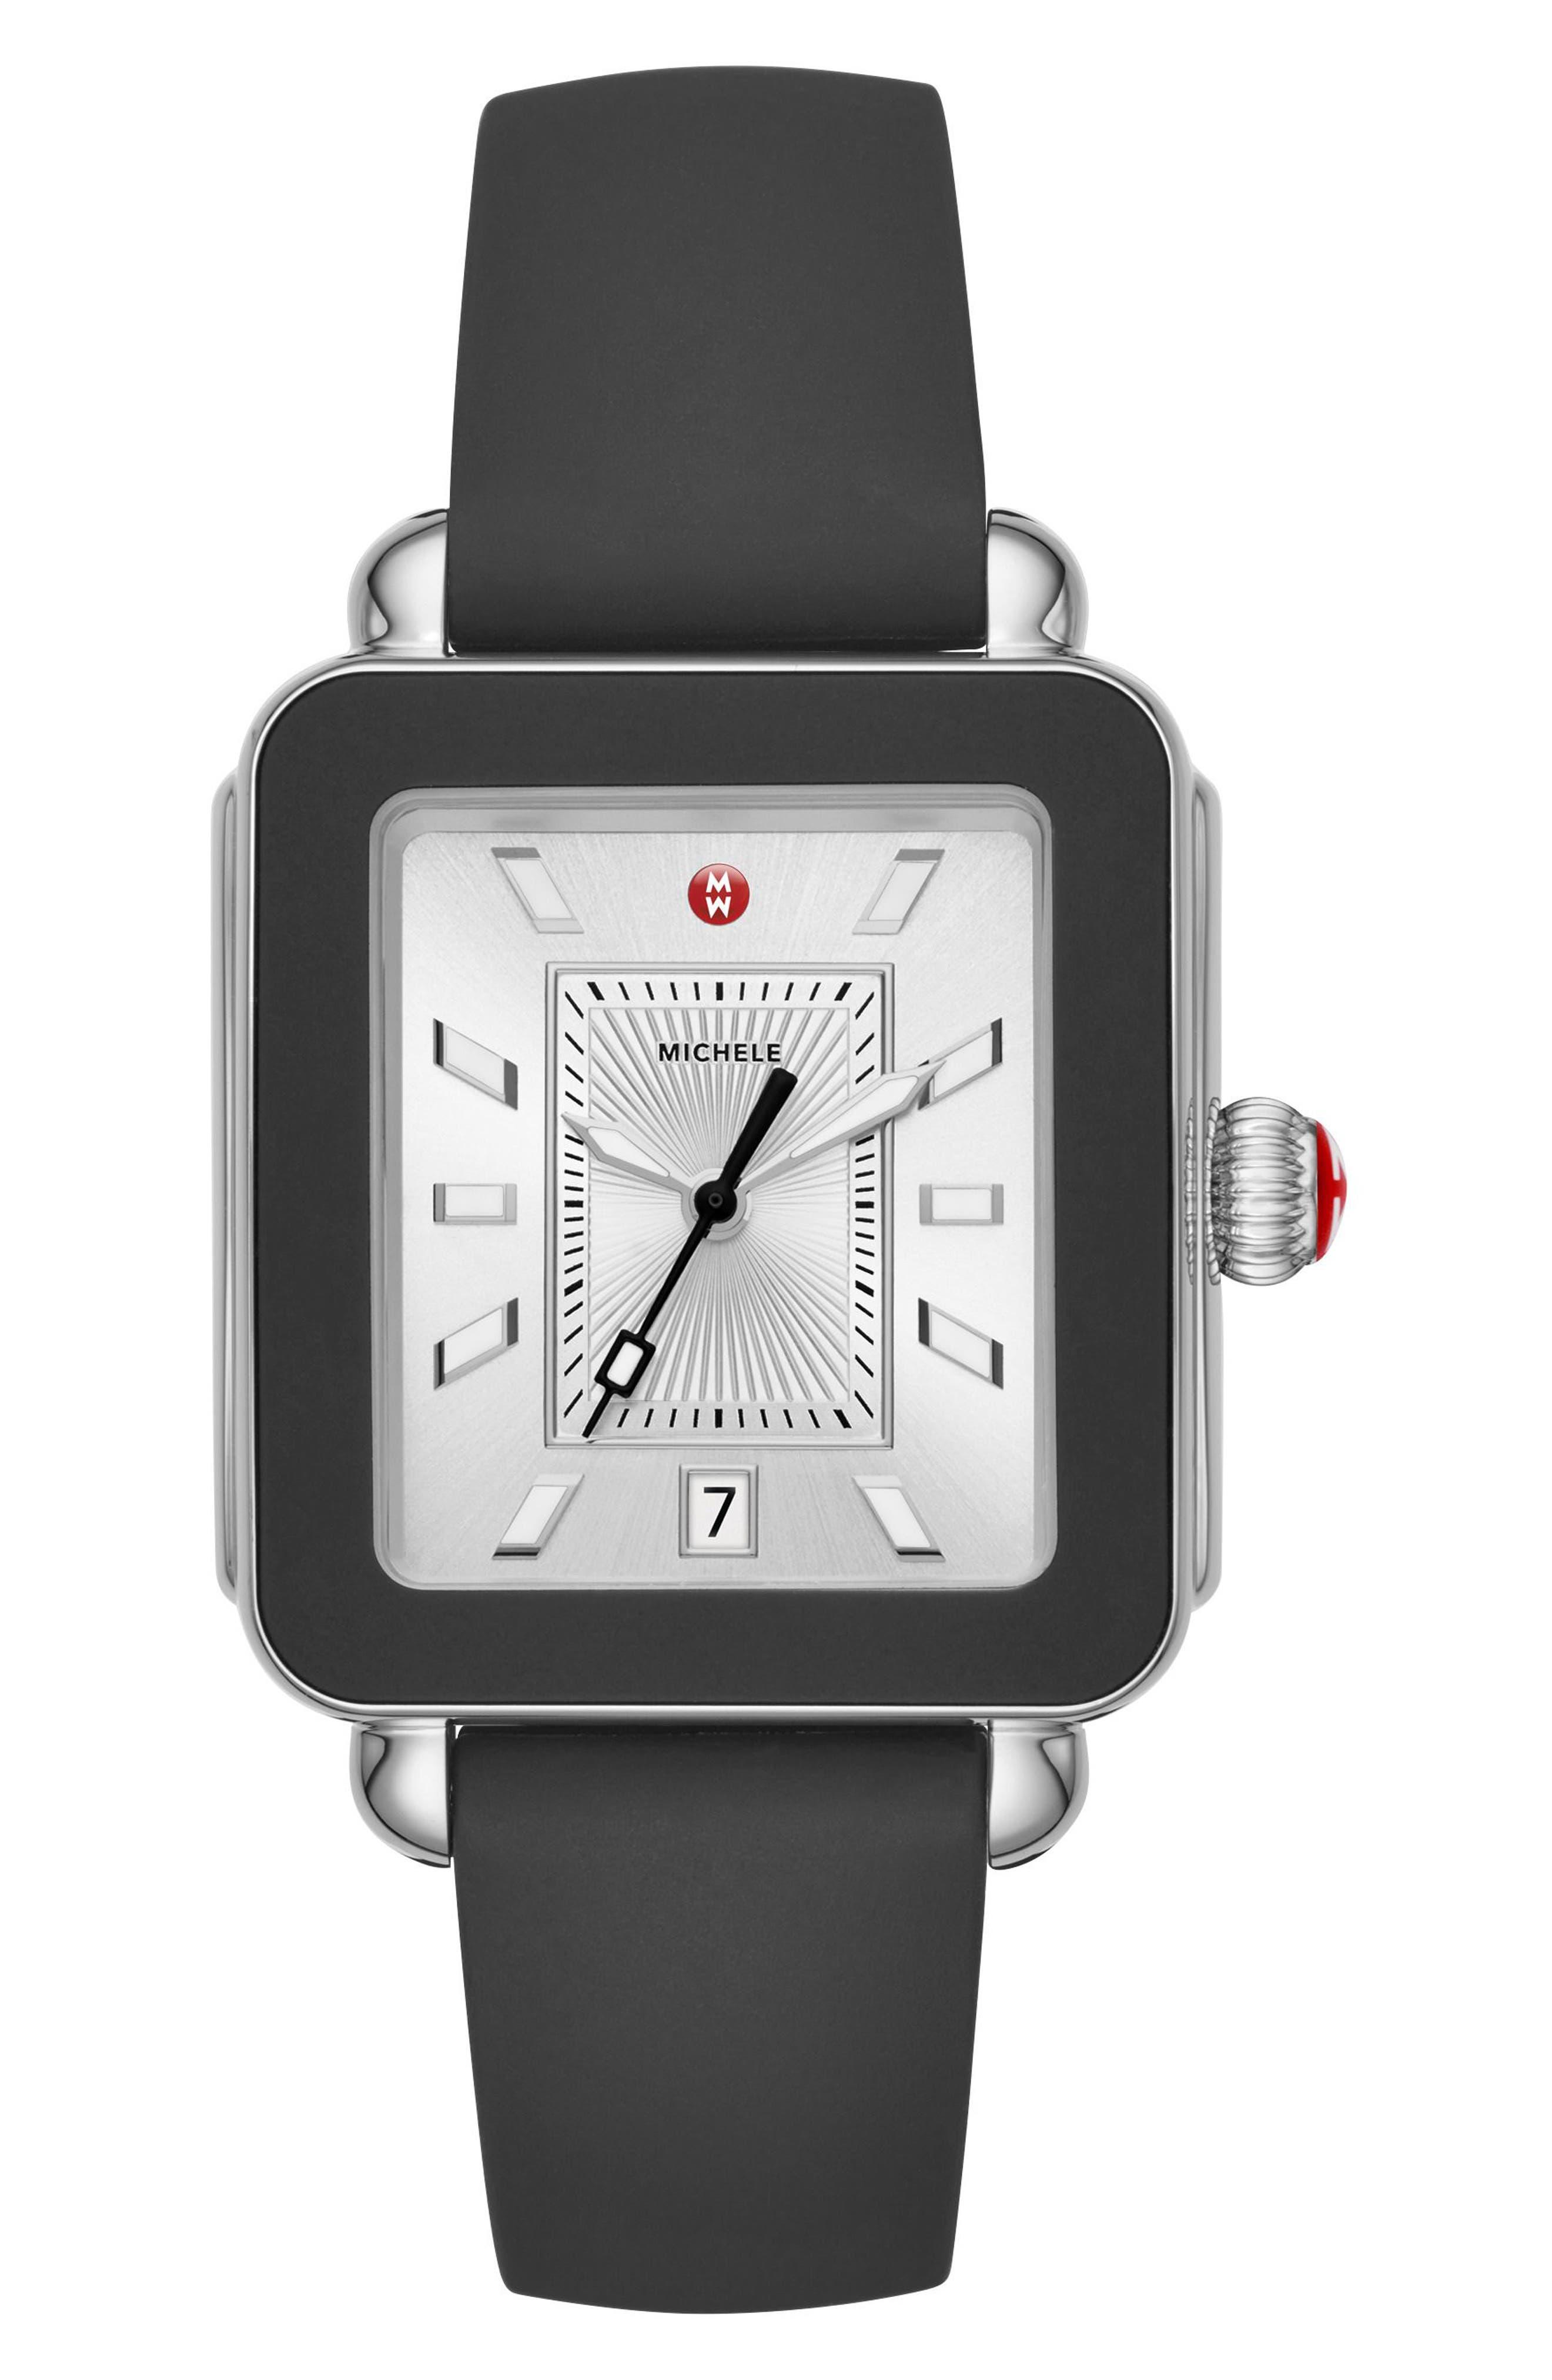 MICHELE Deco Sport Watch Head & Silicone Strap Watch, 34Mm X 36Mm in Black/ Silver/ Silver